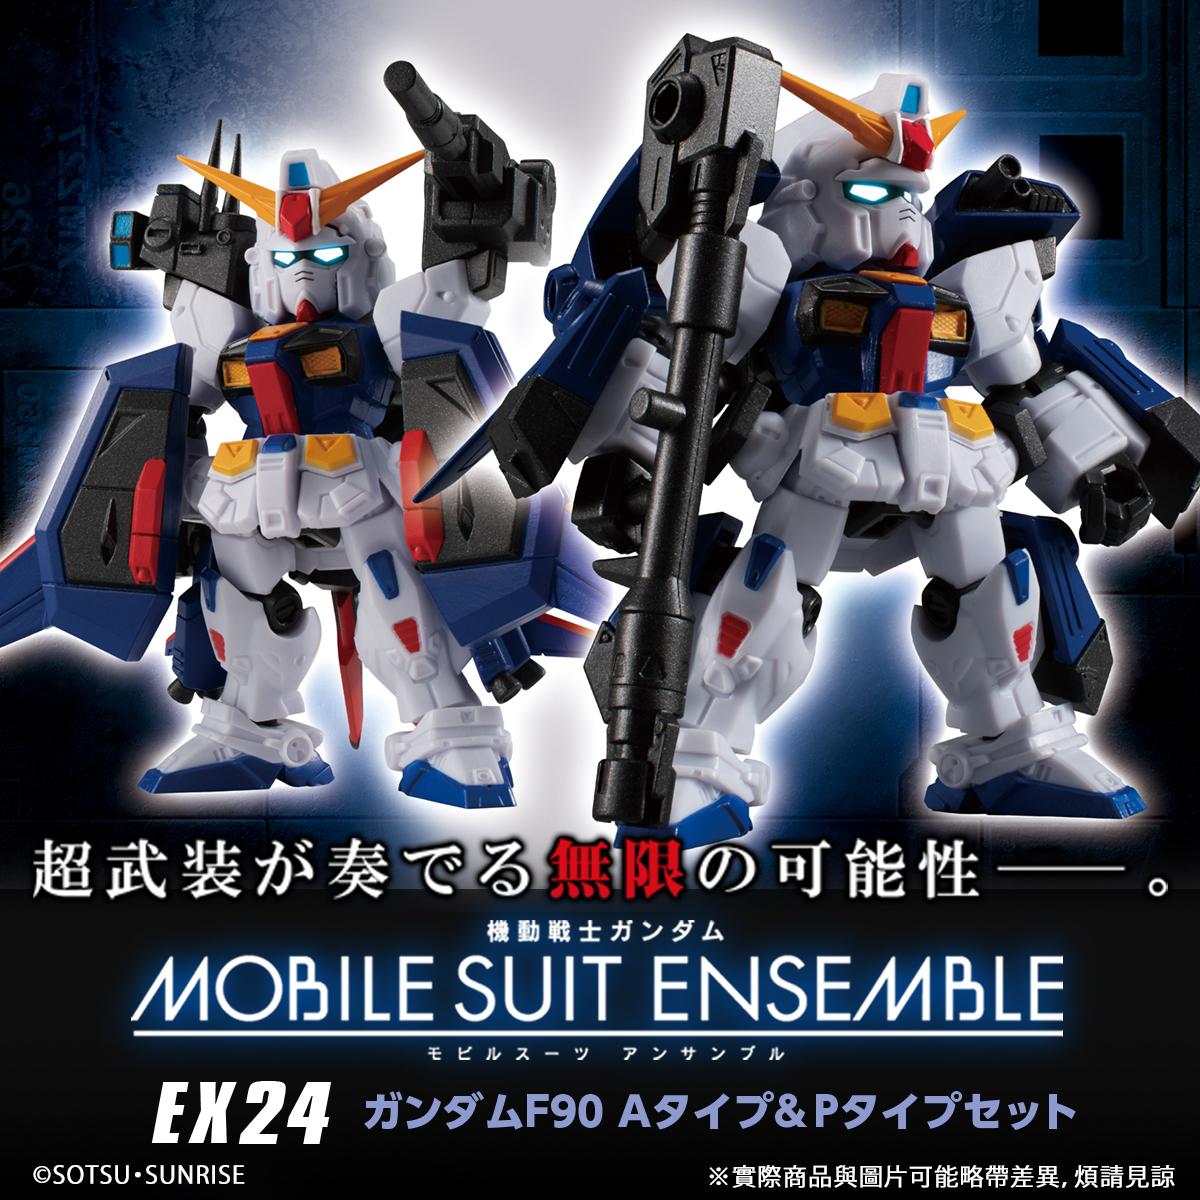 MOBILE SUIT ENSEMBLE EX24 GUNDAM F90 ( A-TYPE & P-TYPE SET)